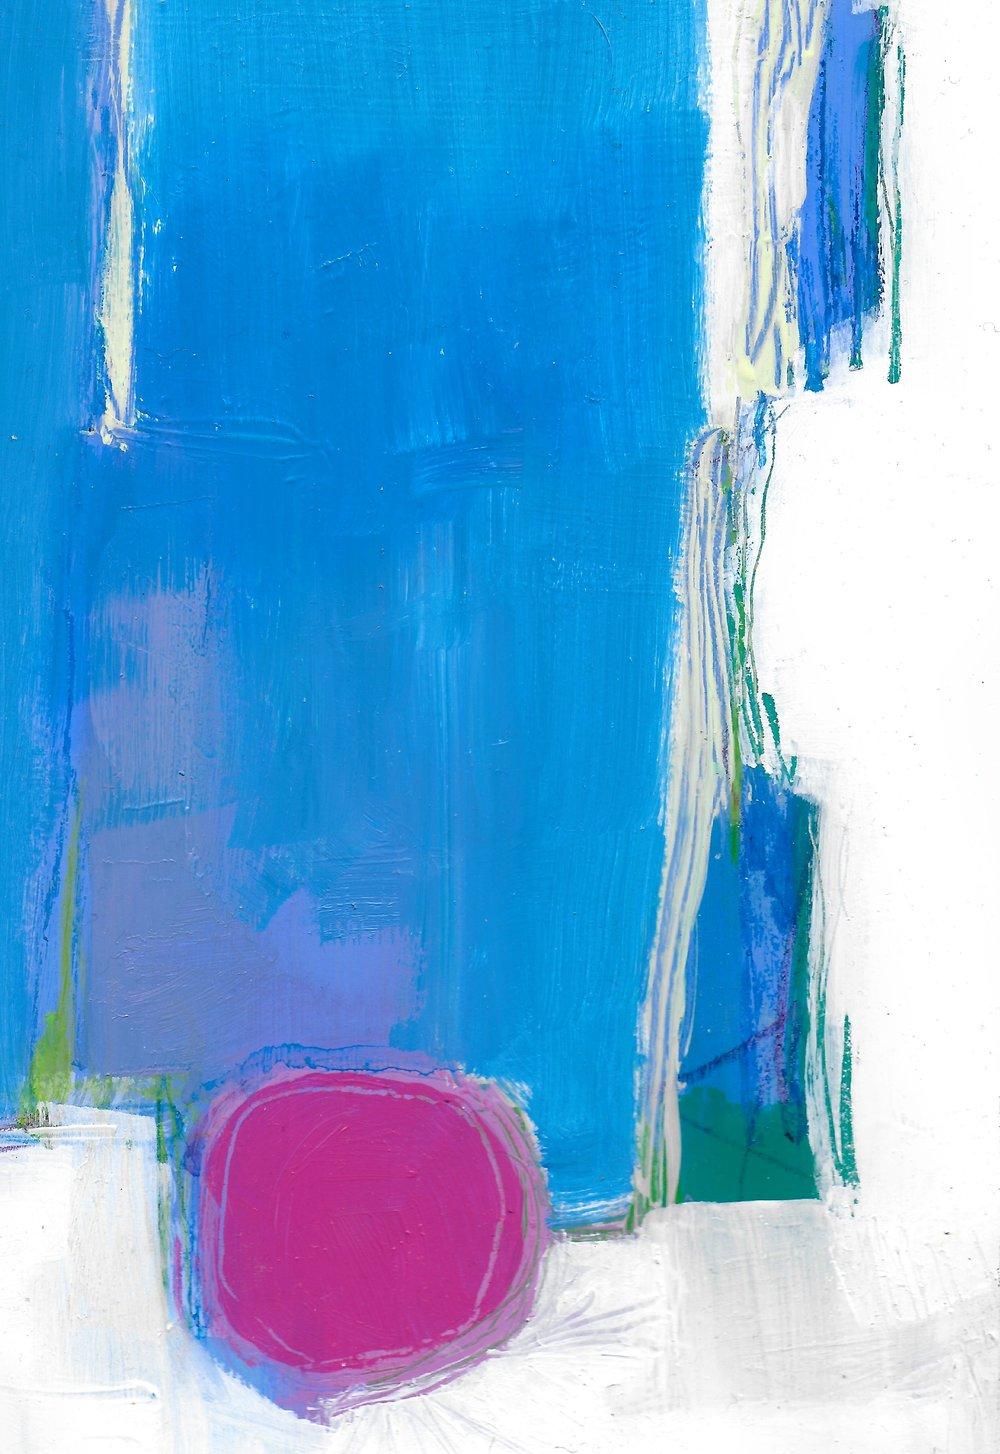 Alicia Chimento - Settling - Oil on paper